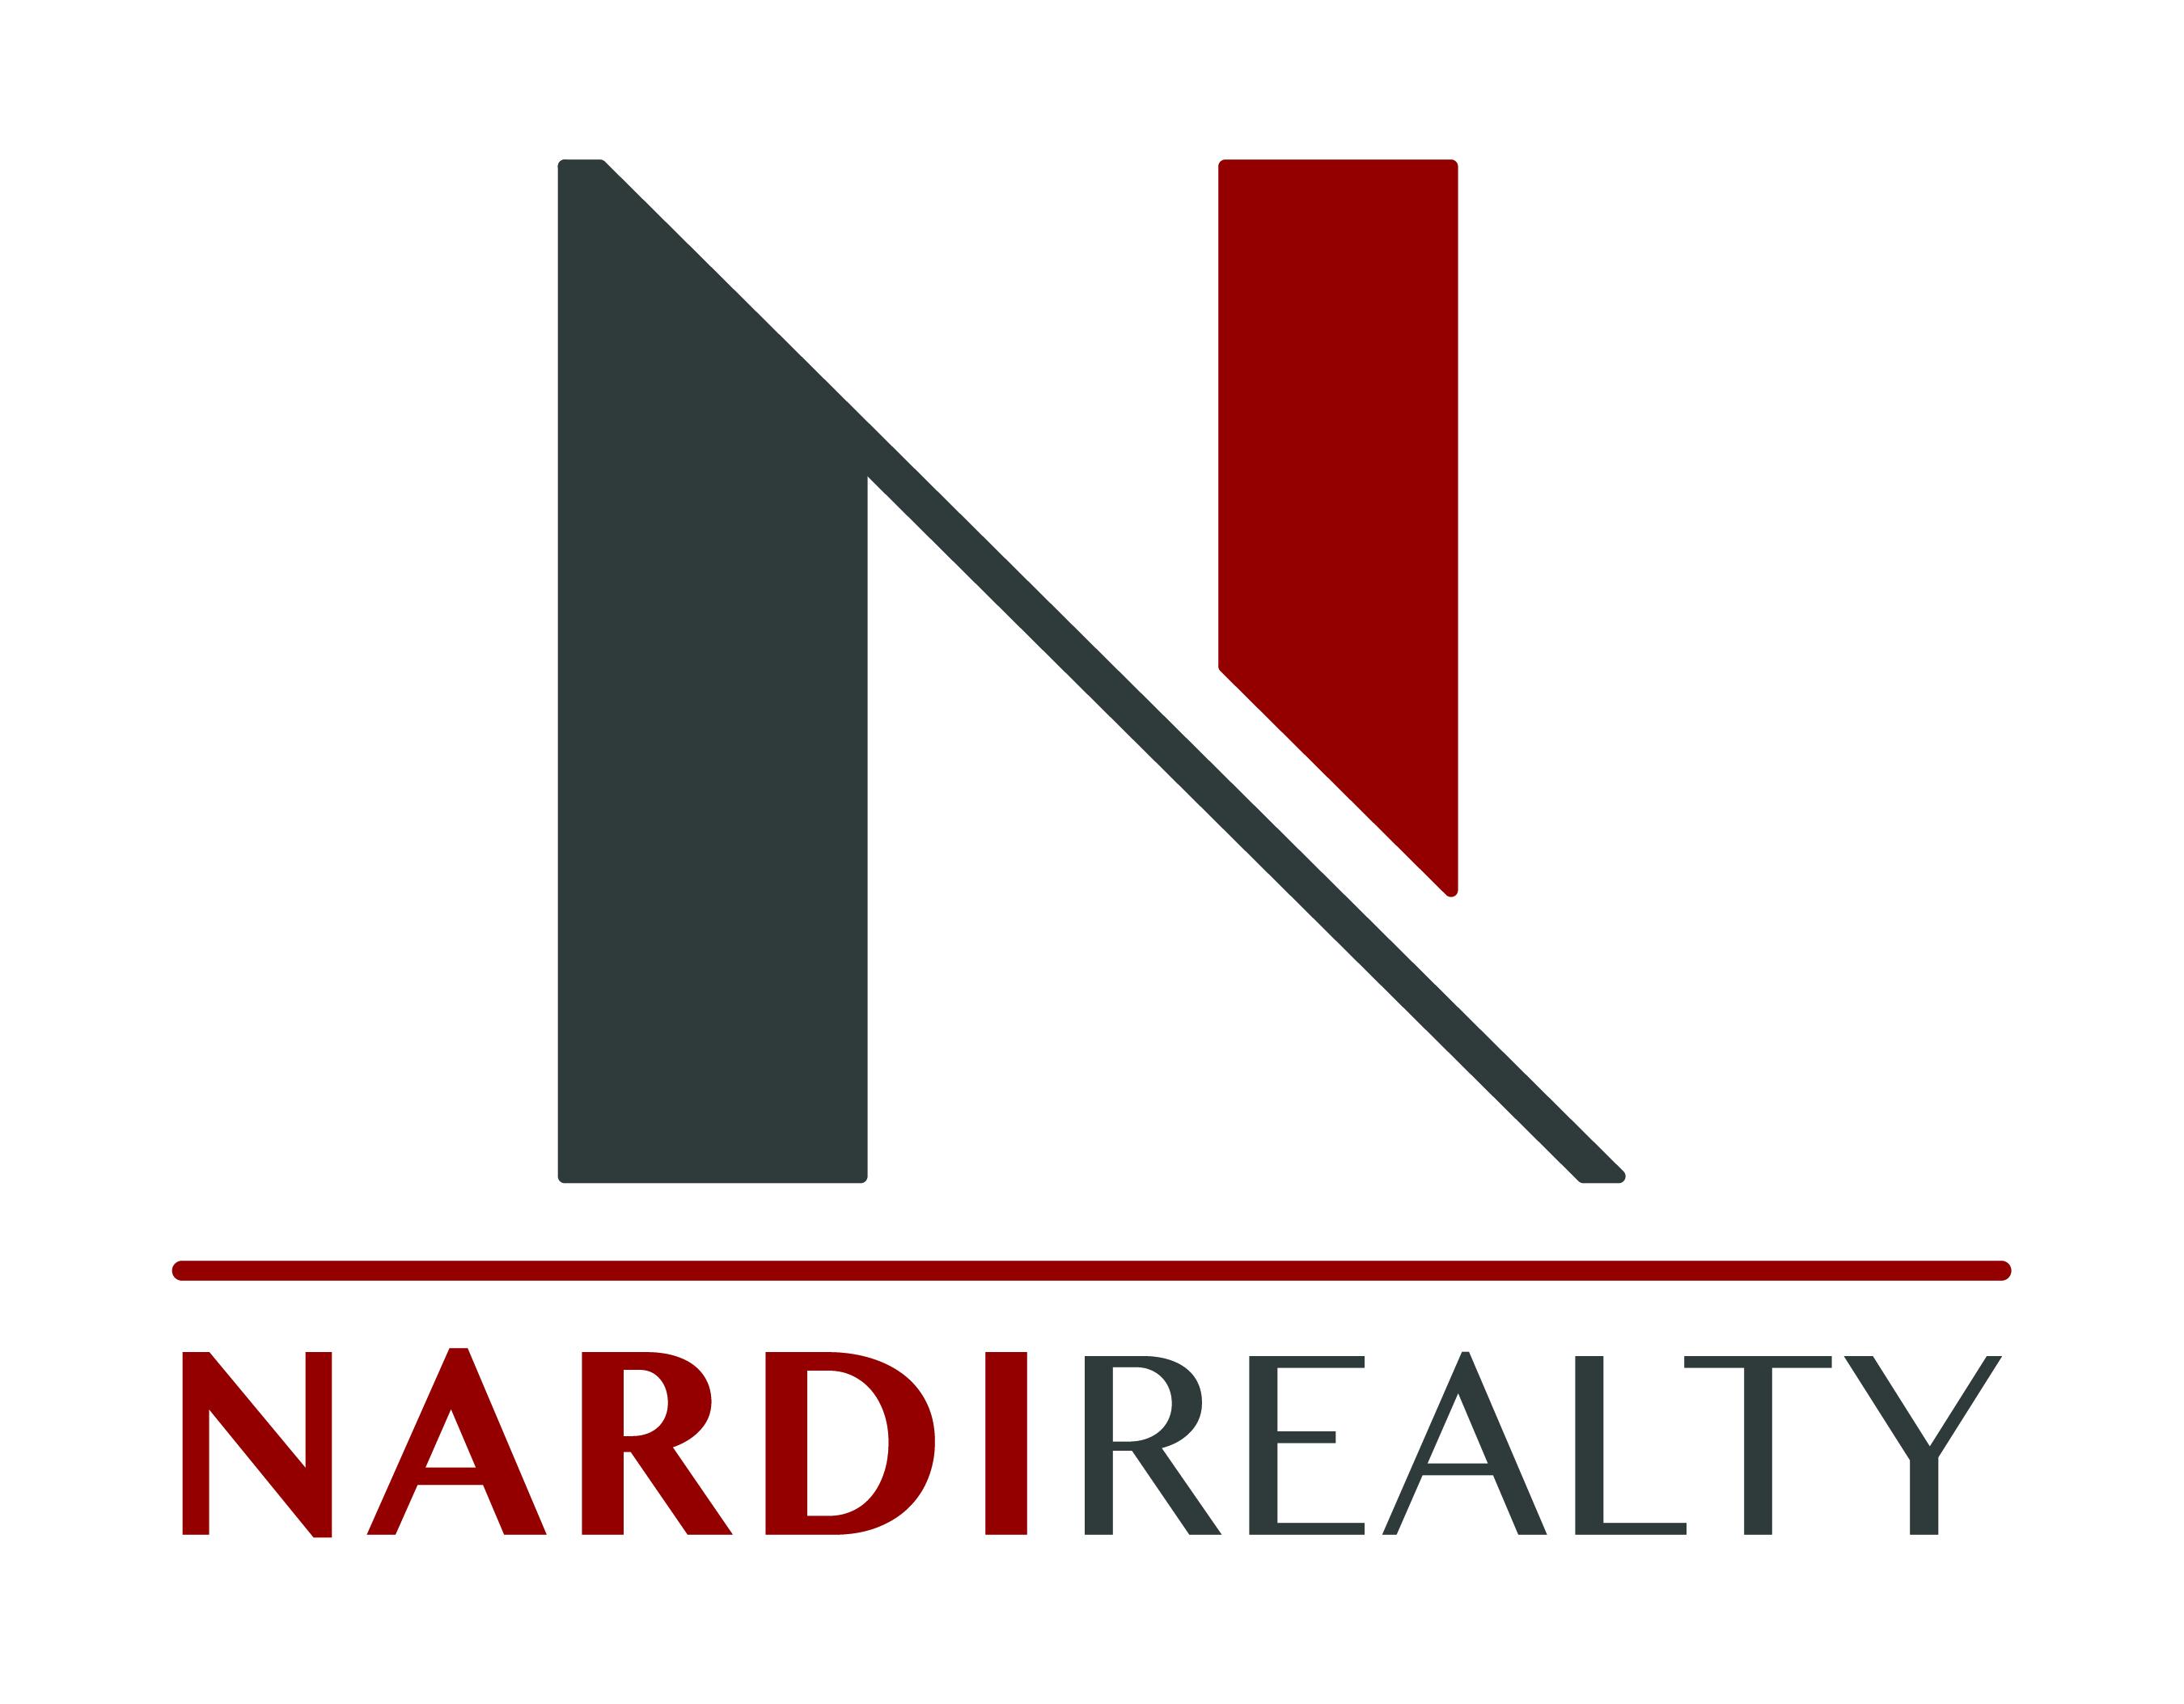 Nardi Realty